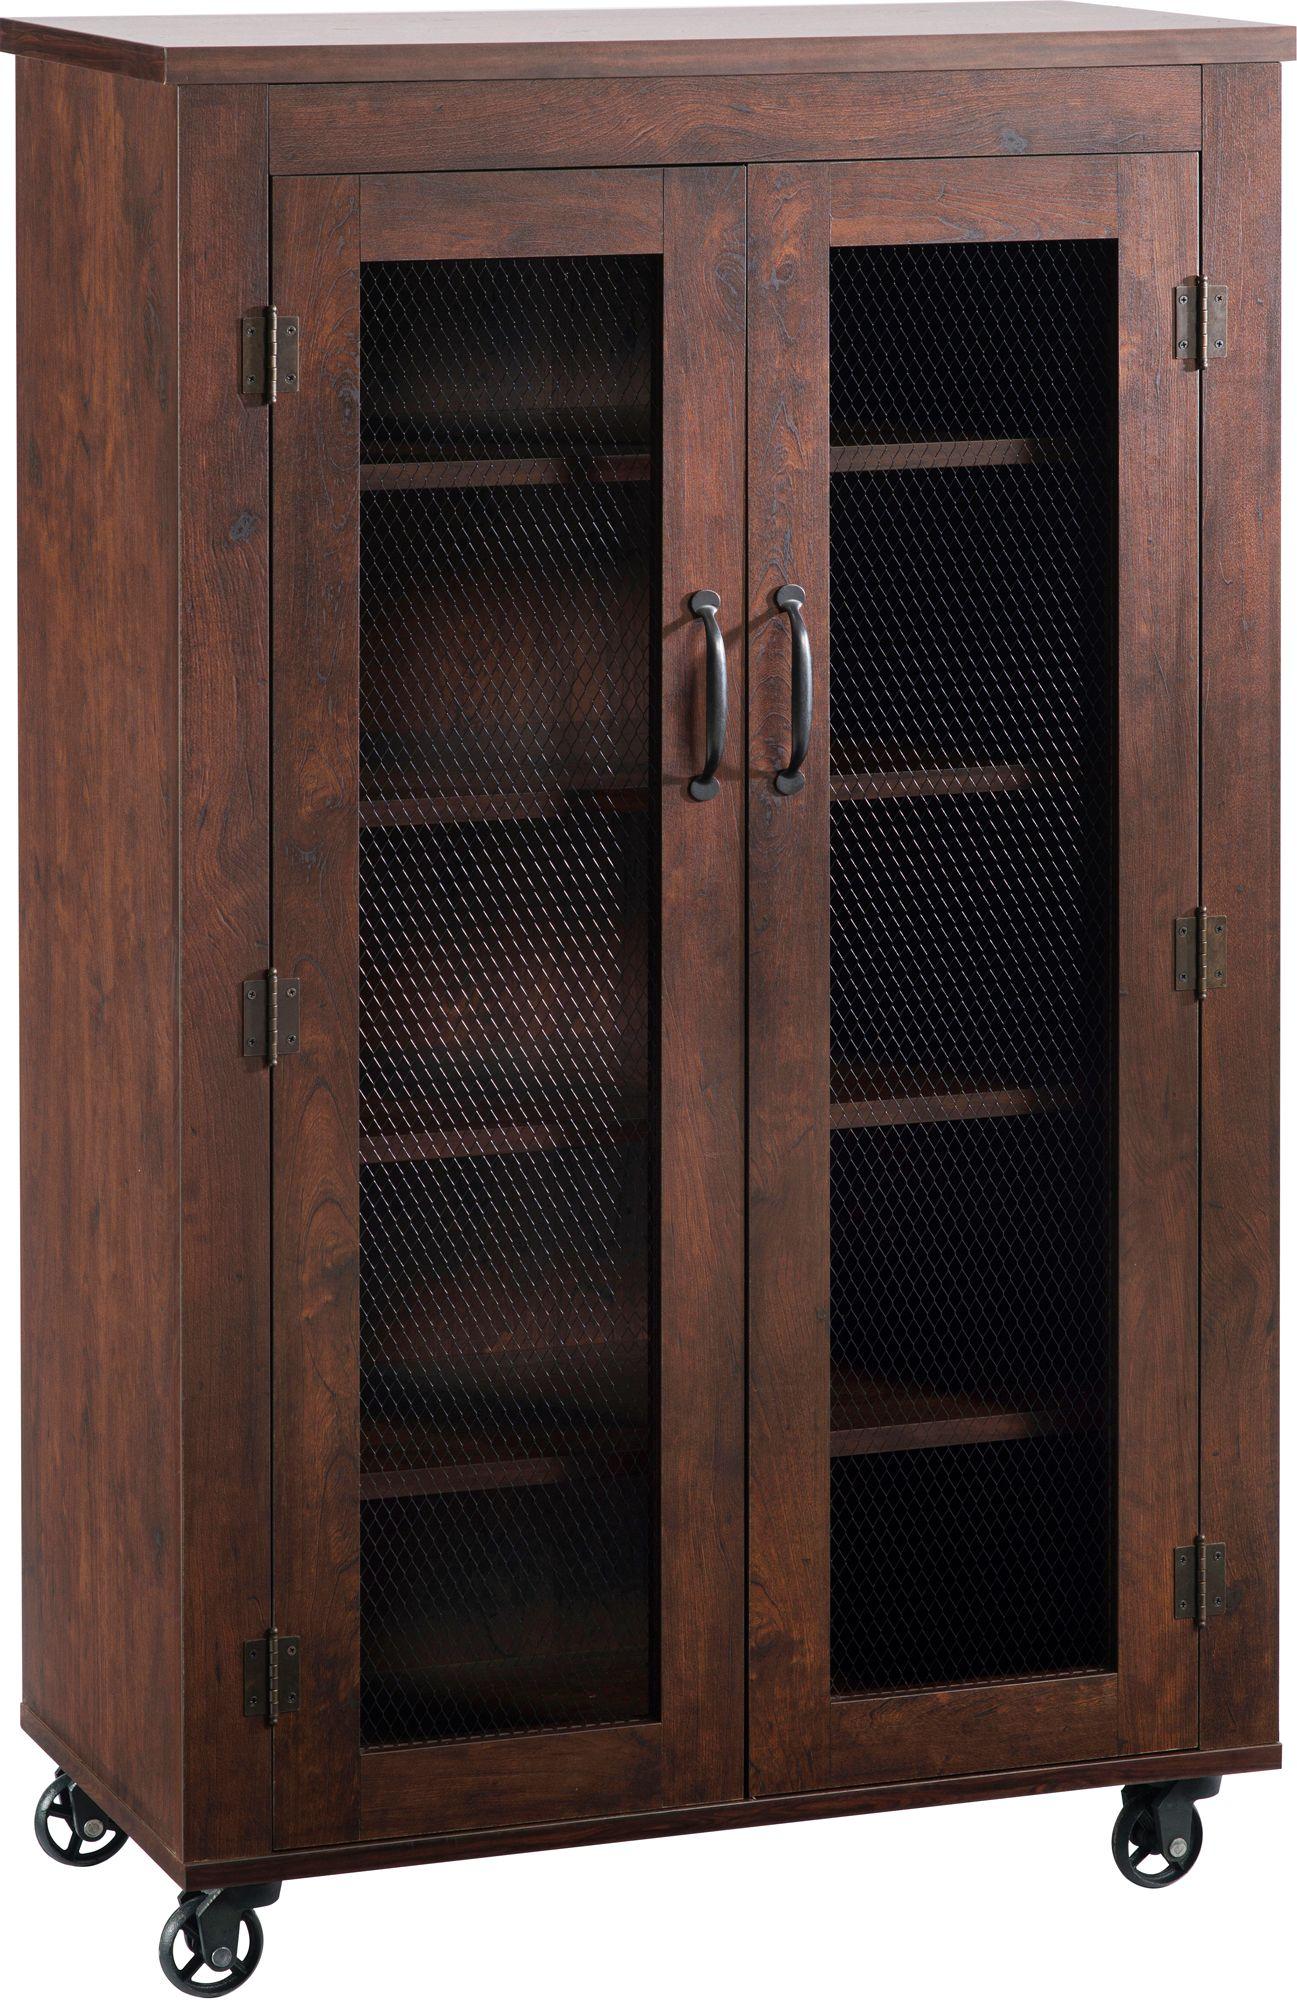 Weaver Vintage Walnut 5 Shelf Rolling Storage Cabinet